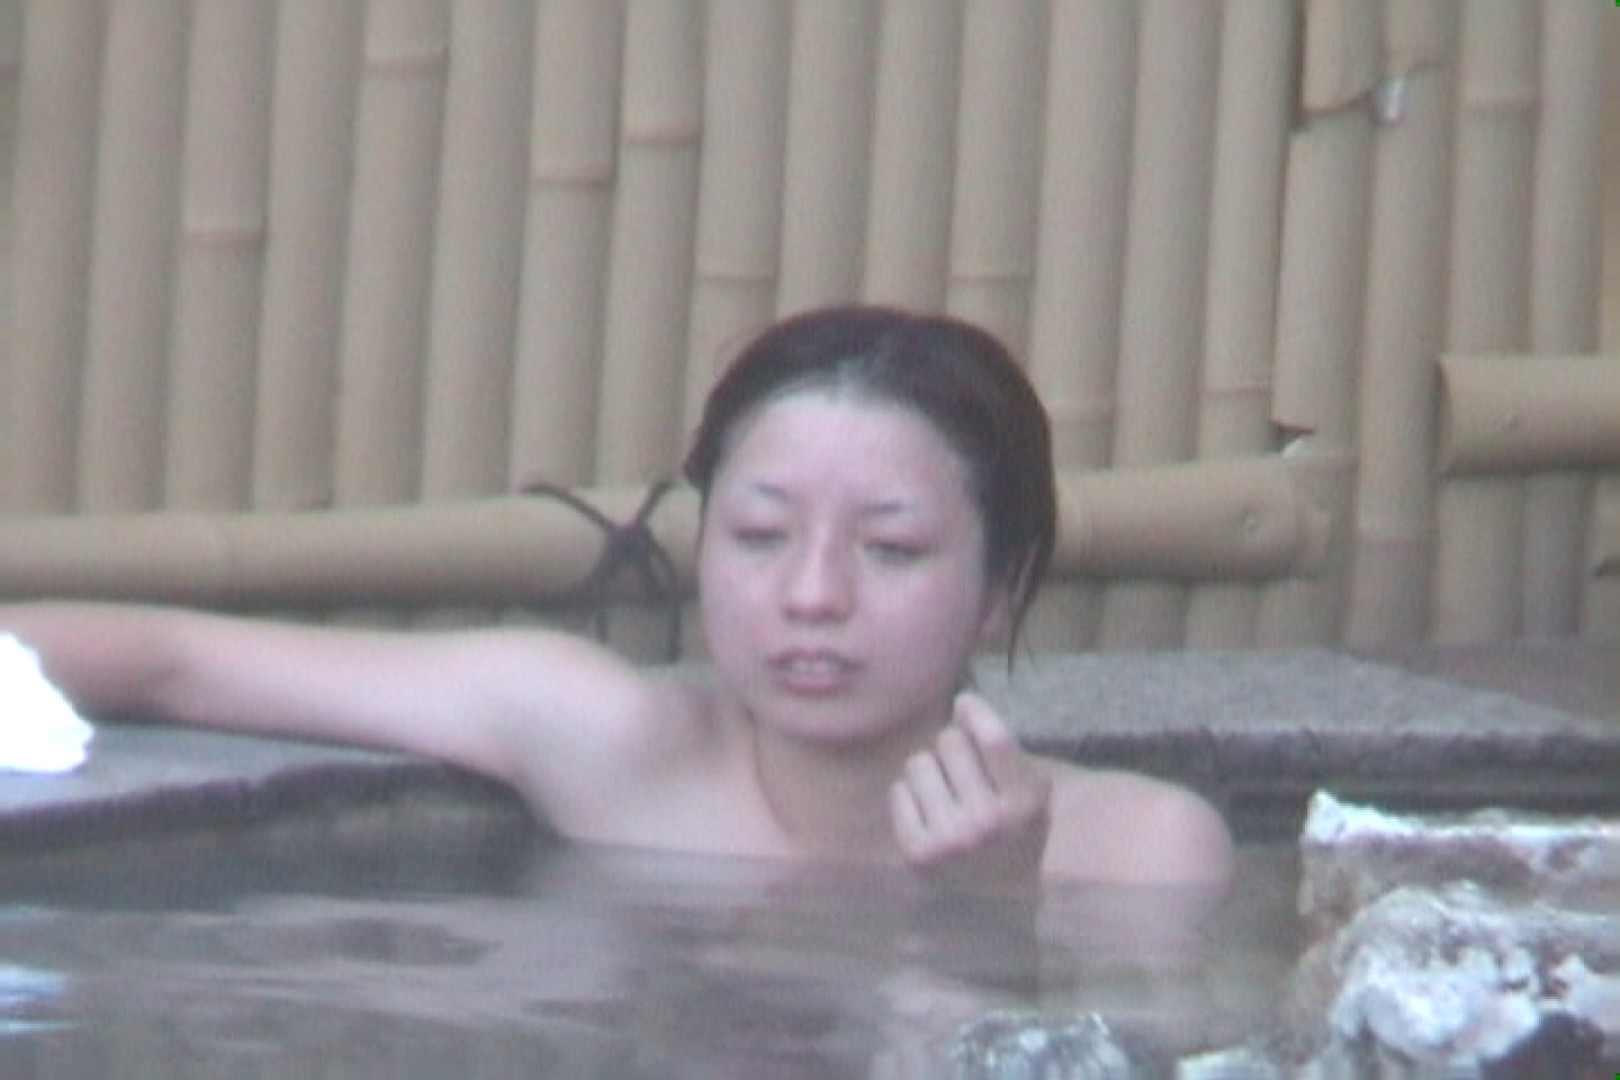 Aquaな露天風呂Vol.608 HなOL | 盗撮  89pic 80